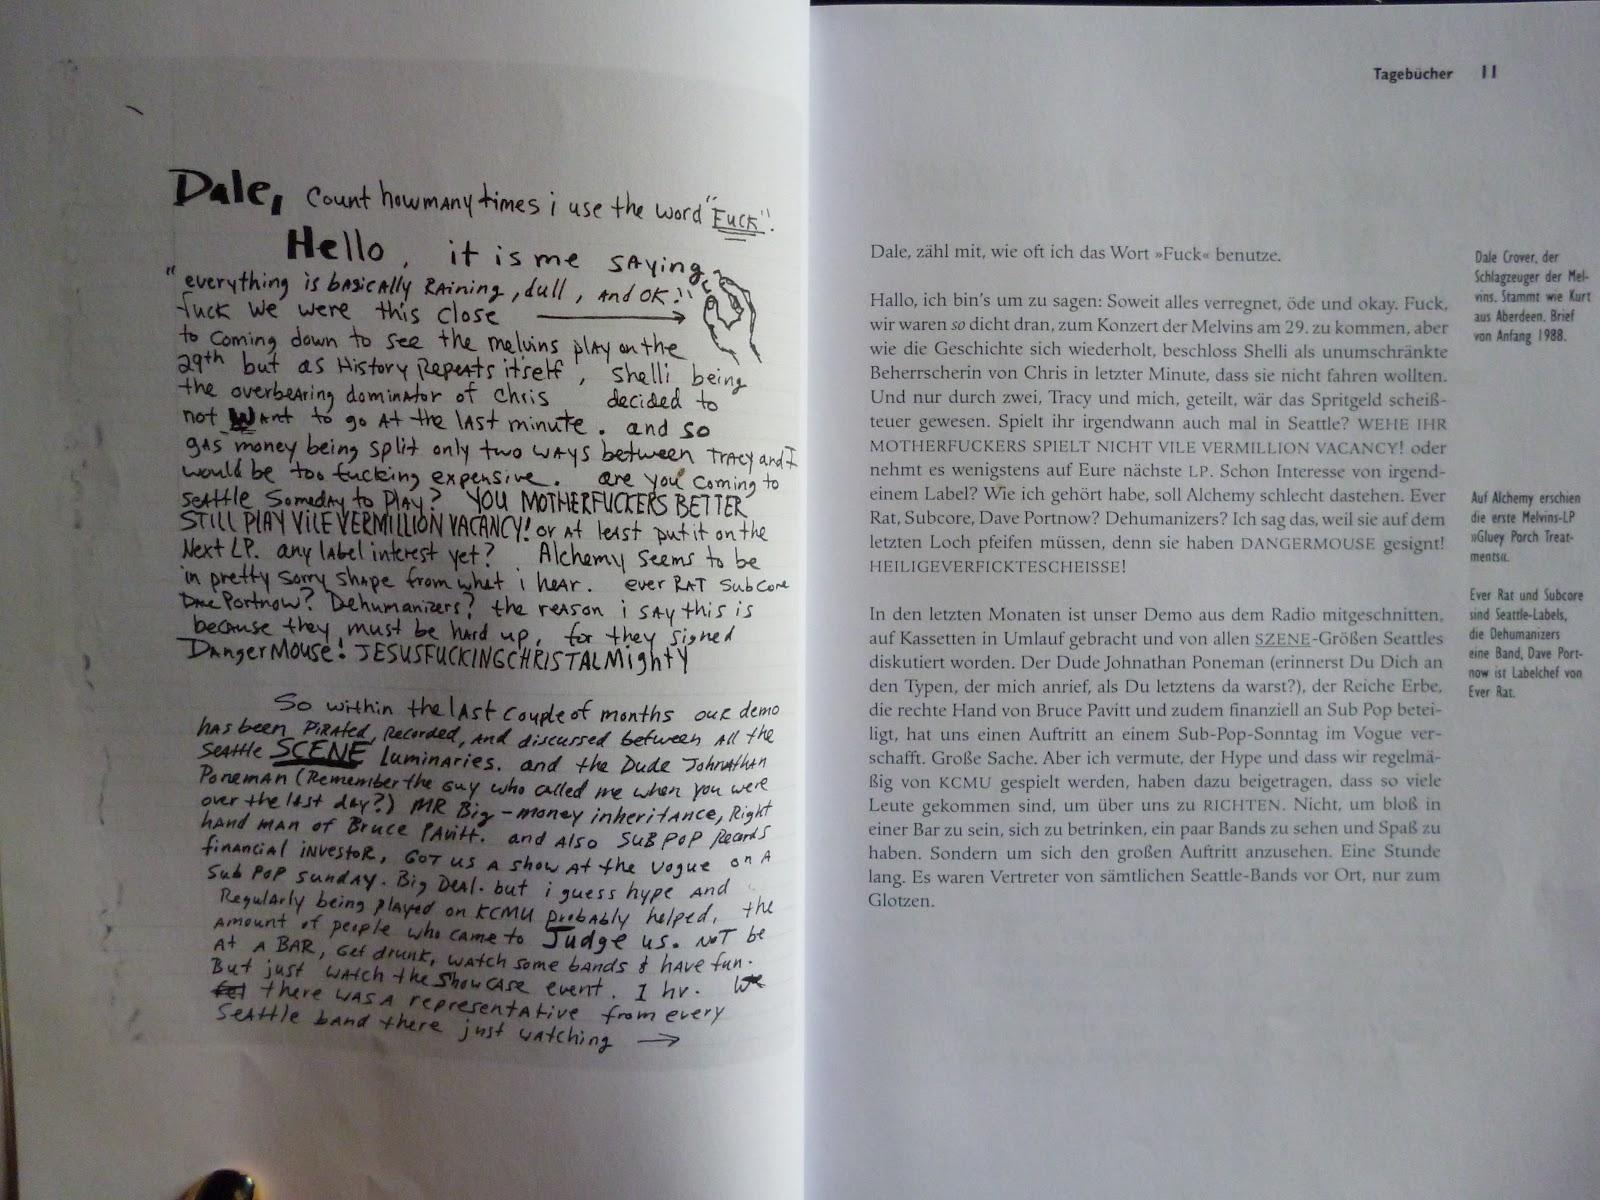 Kurt Cobain Tagebücher